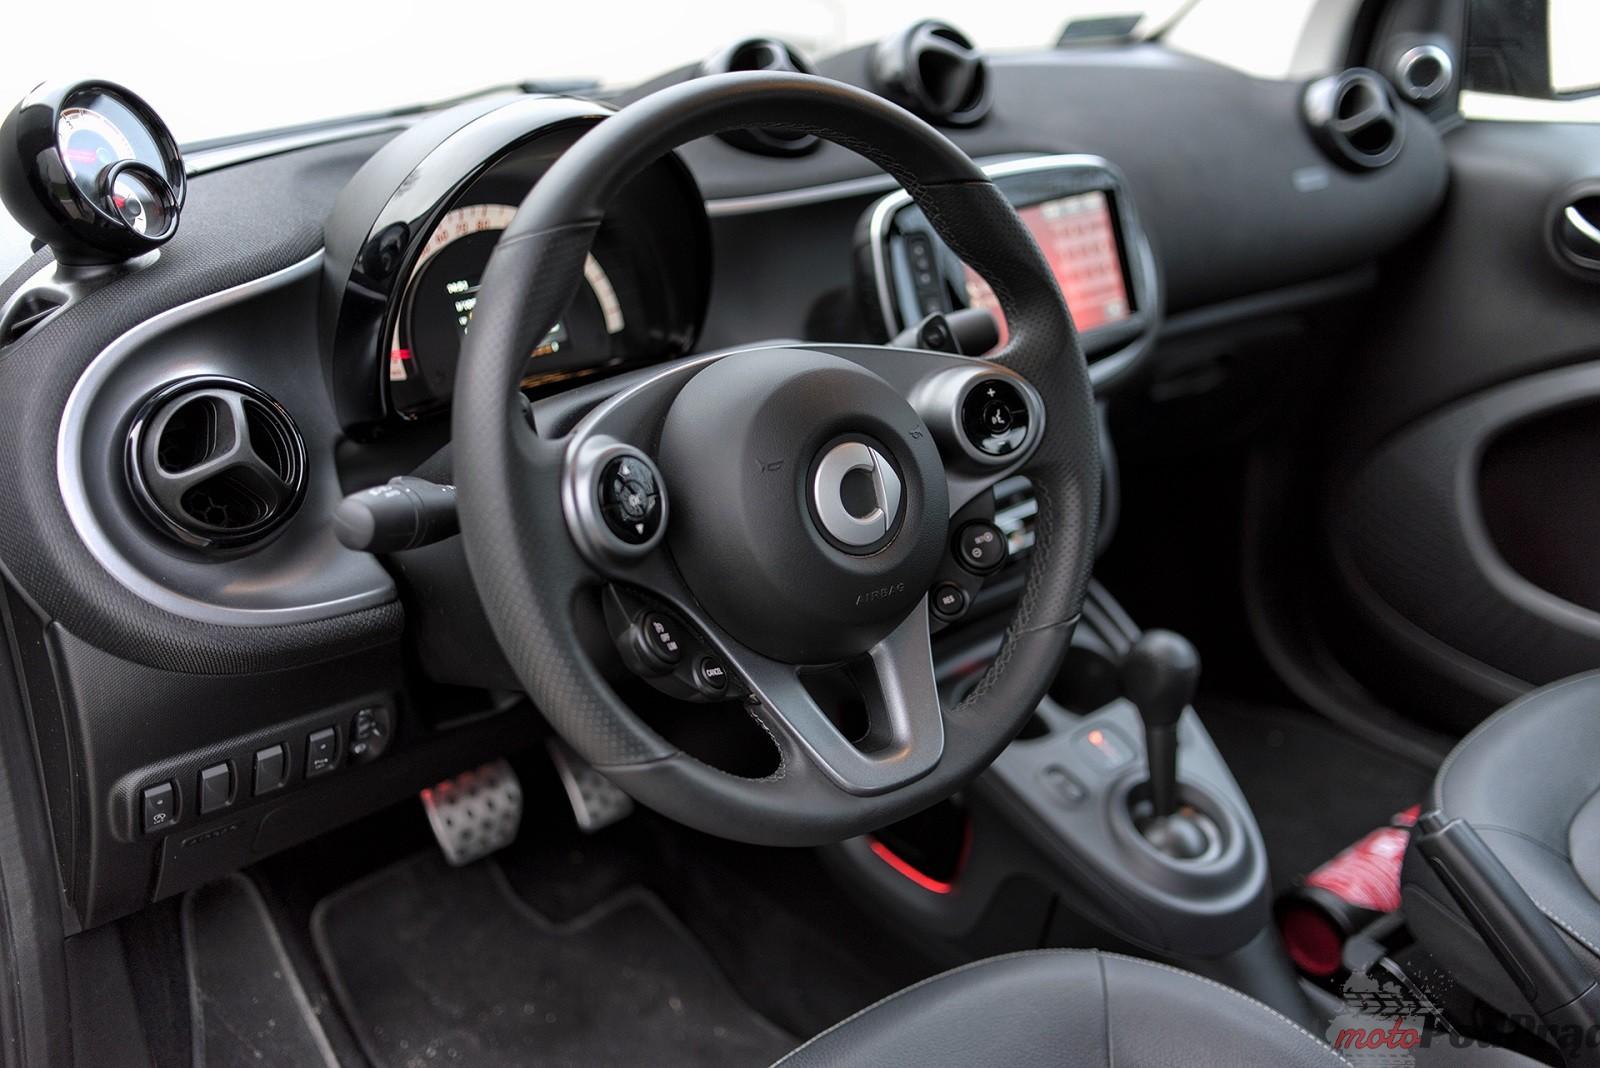 Smart ForTwo Cabrio 18 Test: Smart ForTwo Cabrio   zaskakuje na każdym kroku